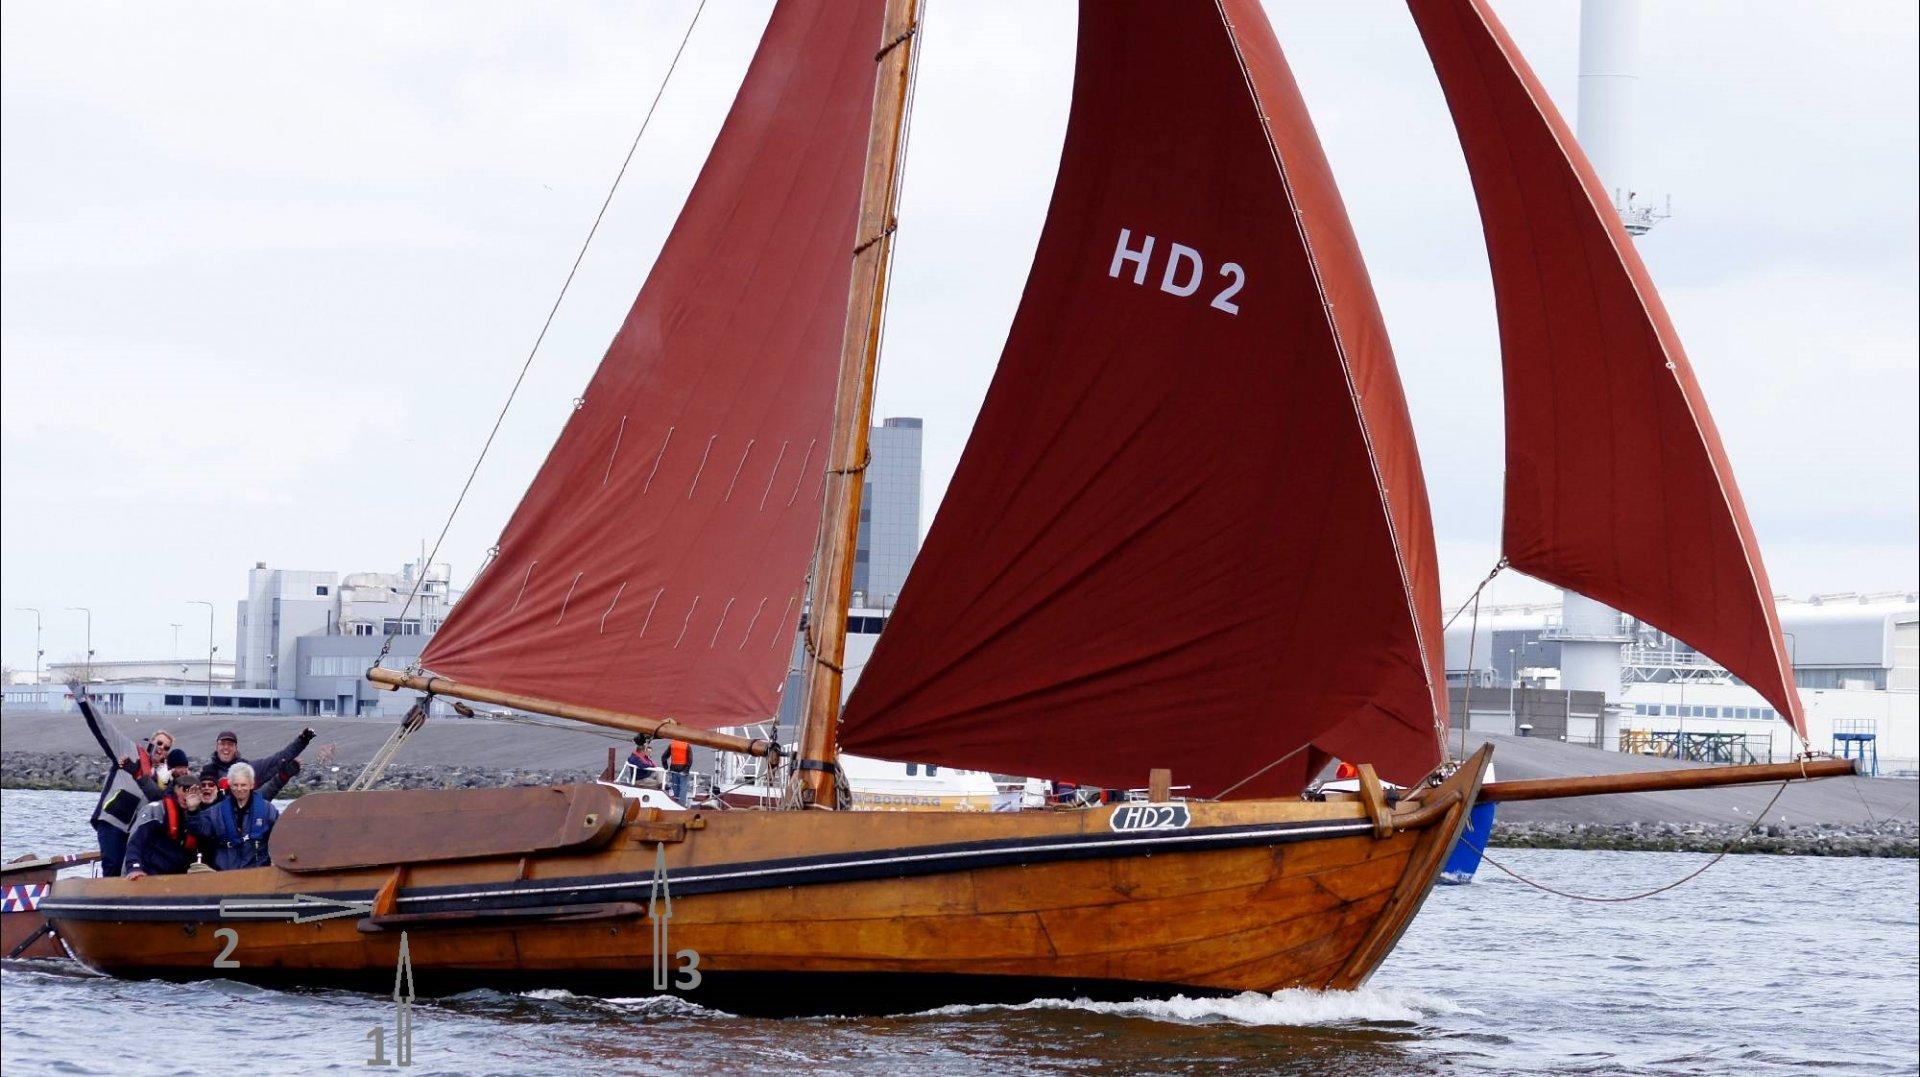 Dutch Botter HD2.jpg